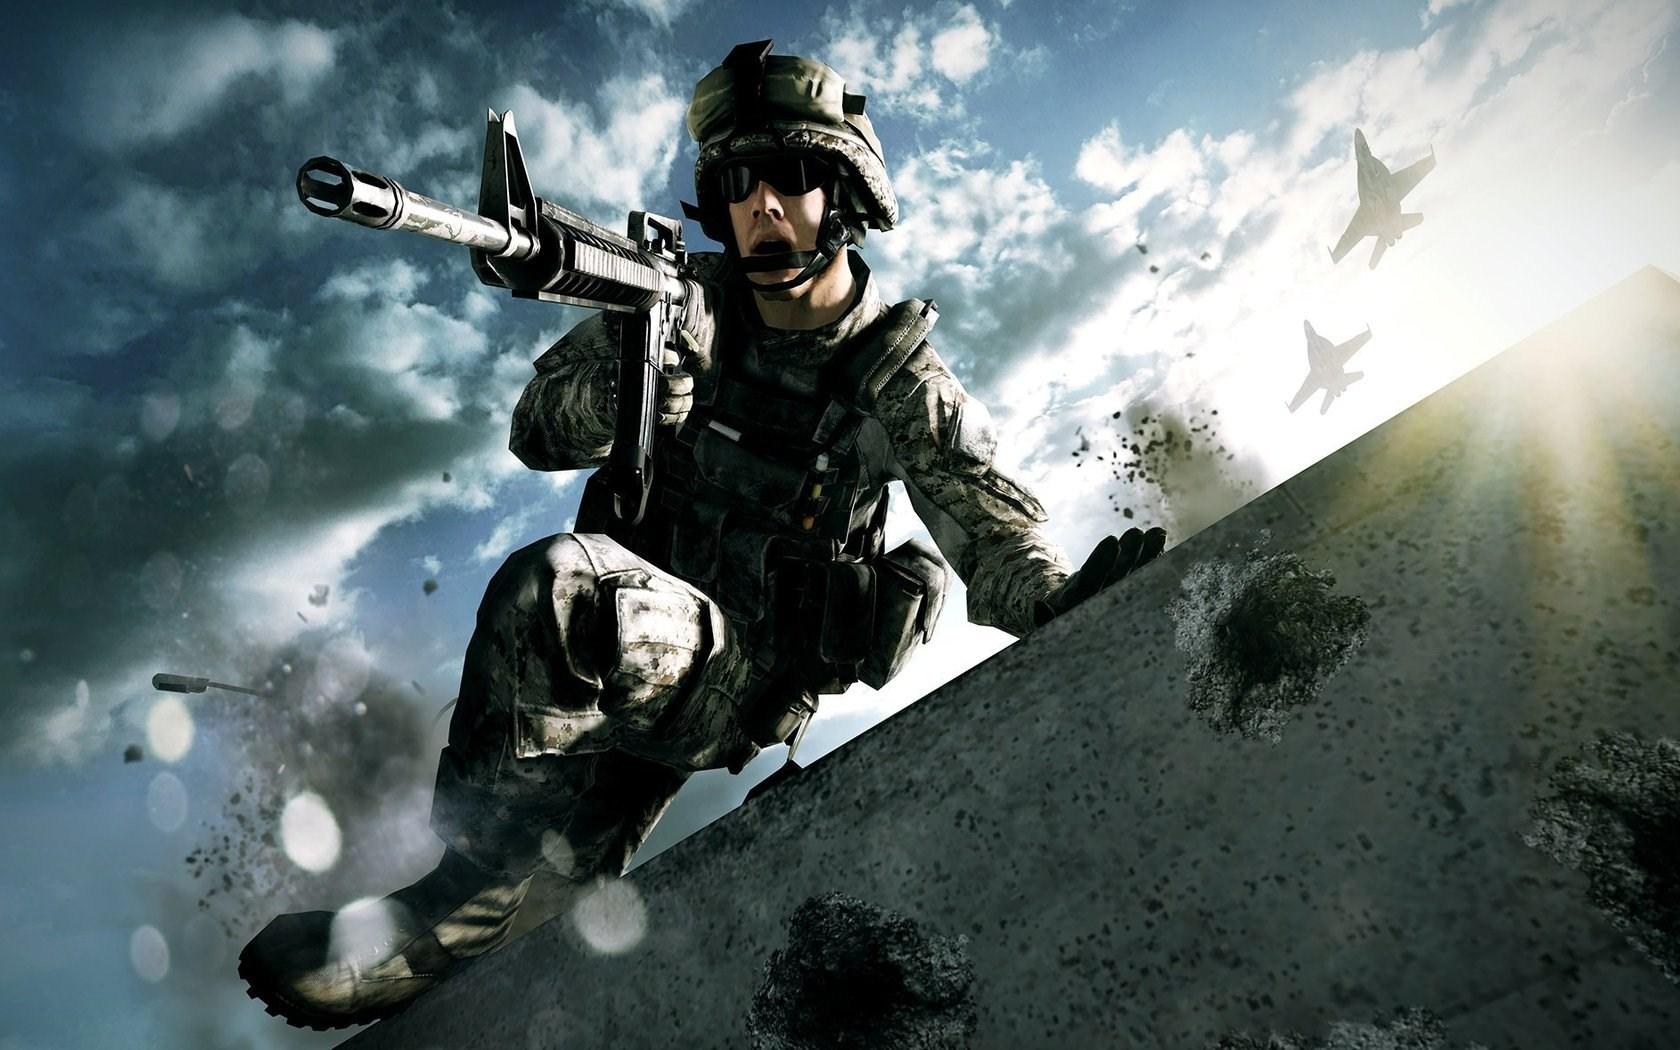 Soldier Wallpaper